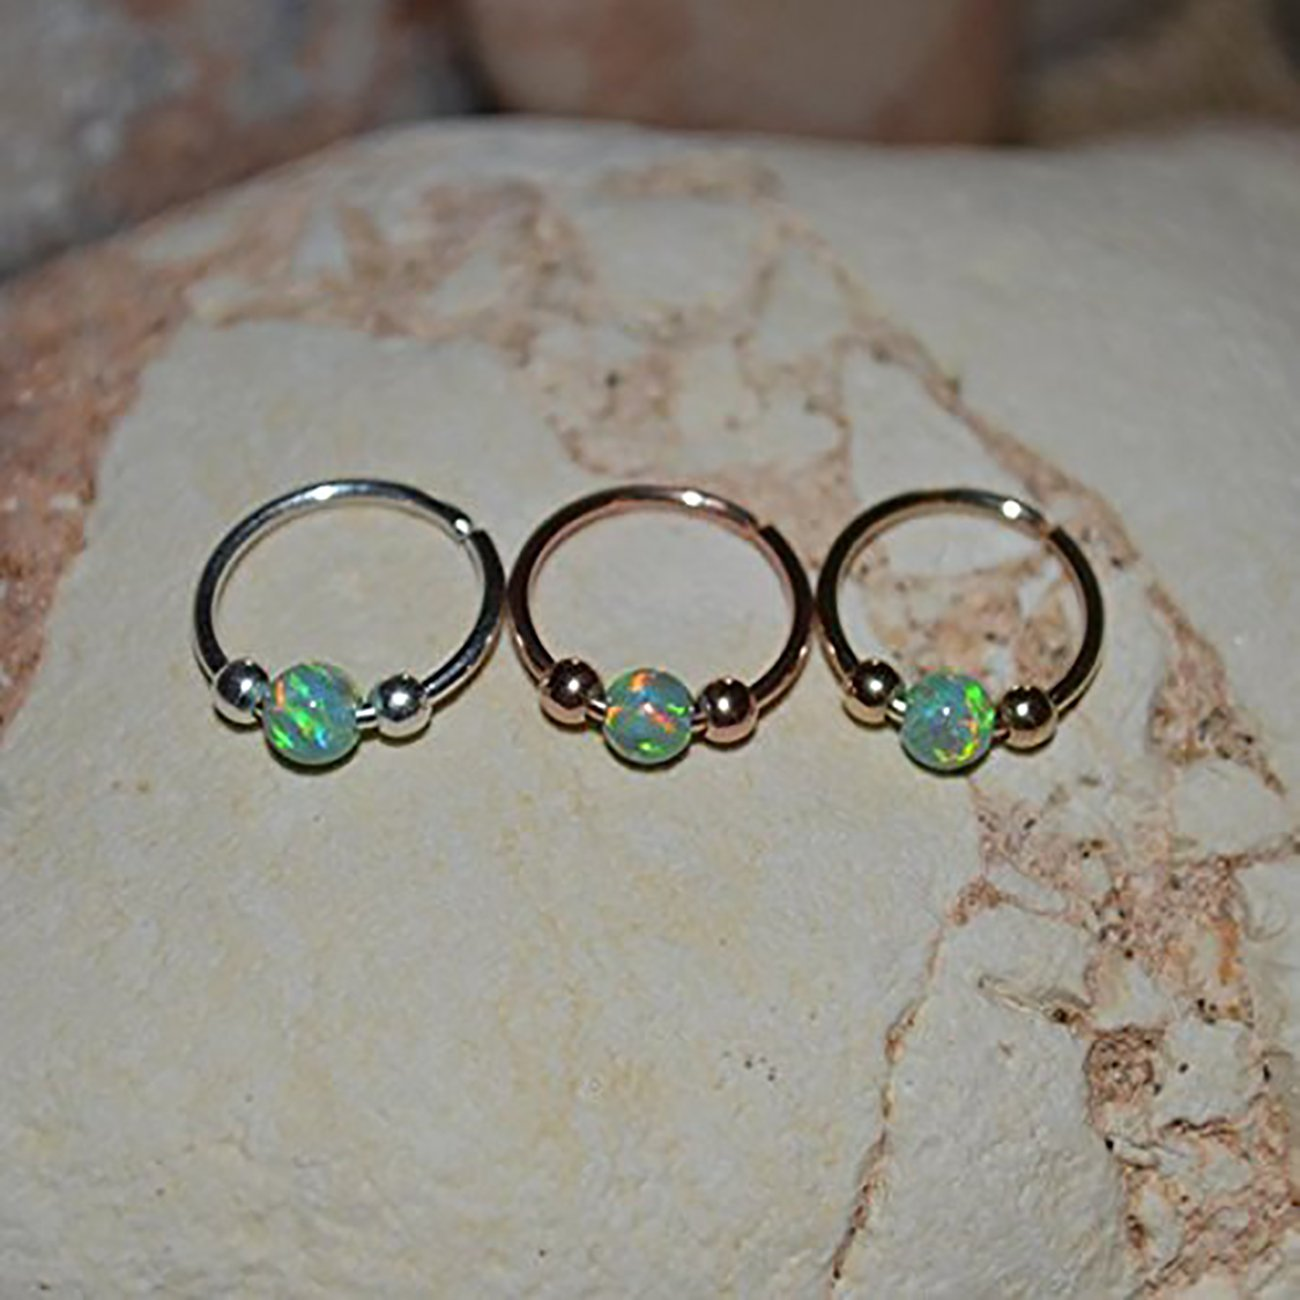 Green Opal TRAGUS EARRING Gold // Nose Ring Stud - Forward Helix Earring - Rook Hoop - Septum Ring - Tragus Stud - Cartilage Ring 20 gauge